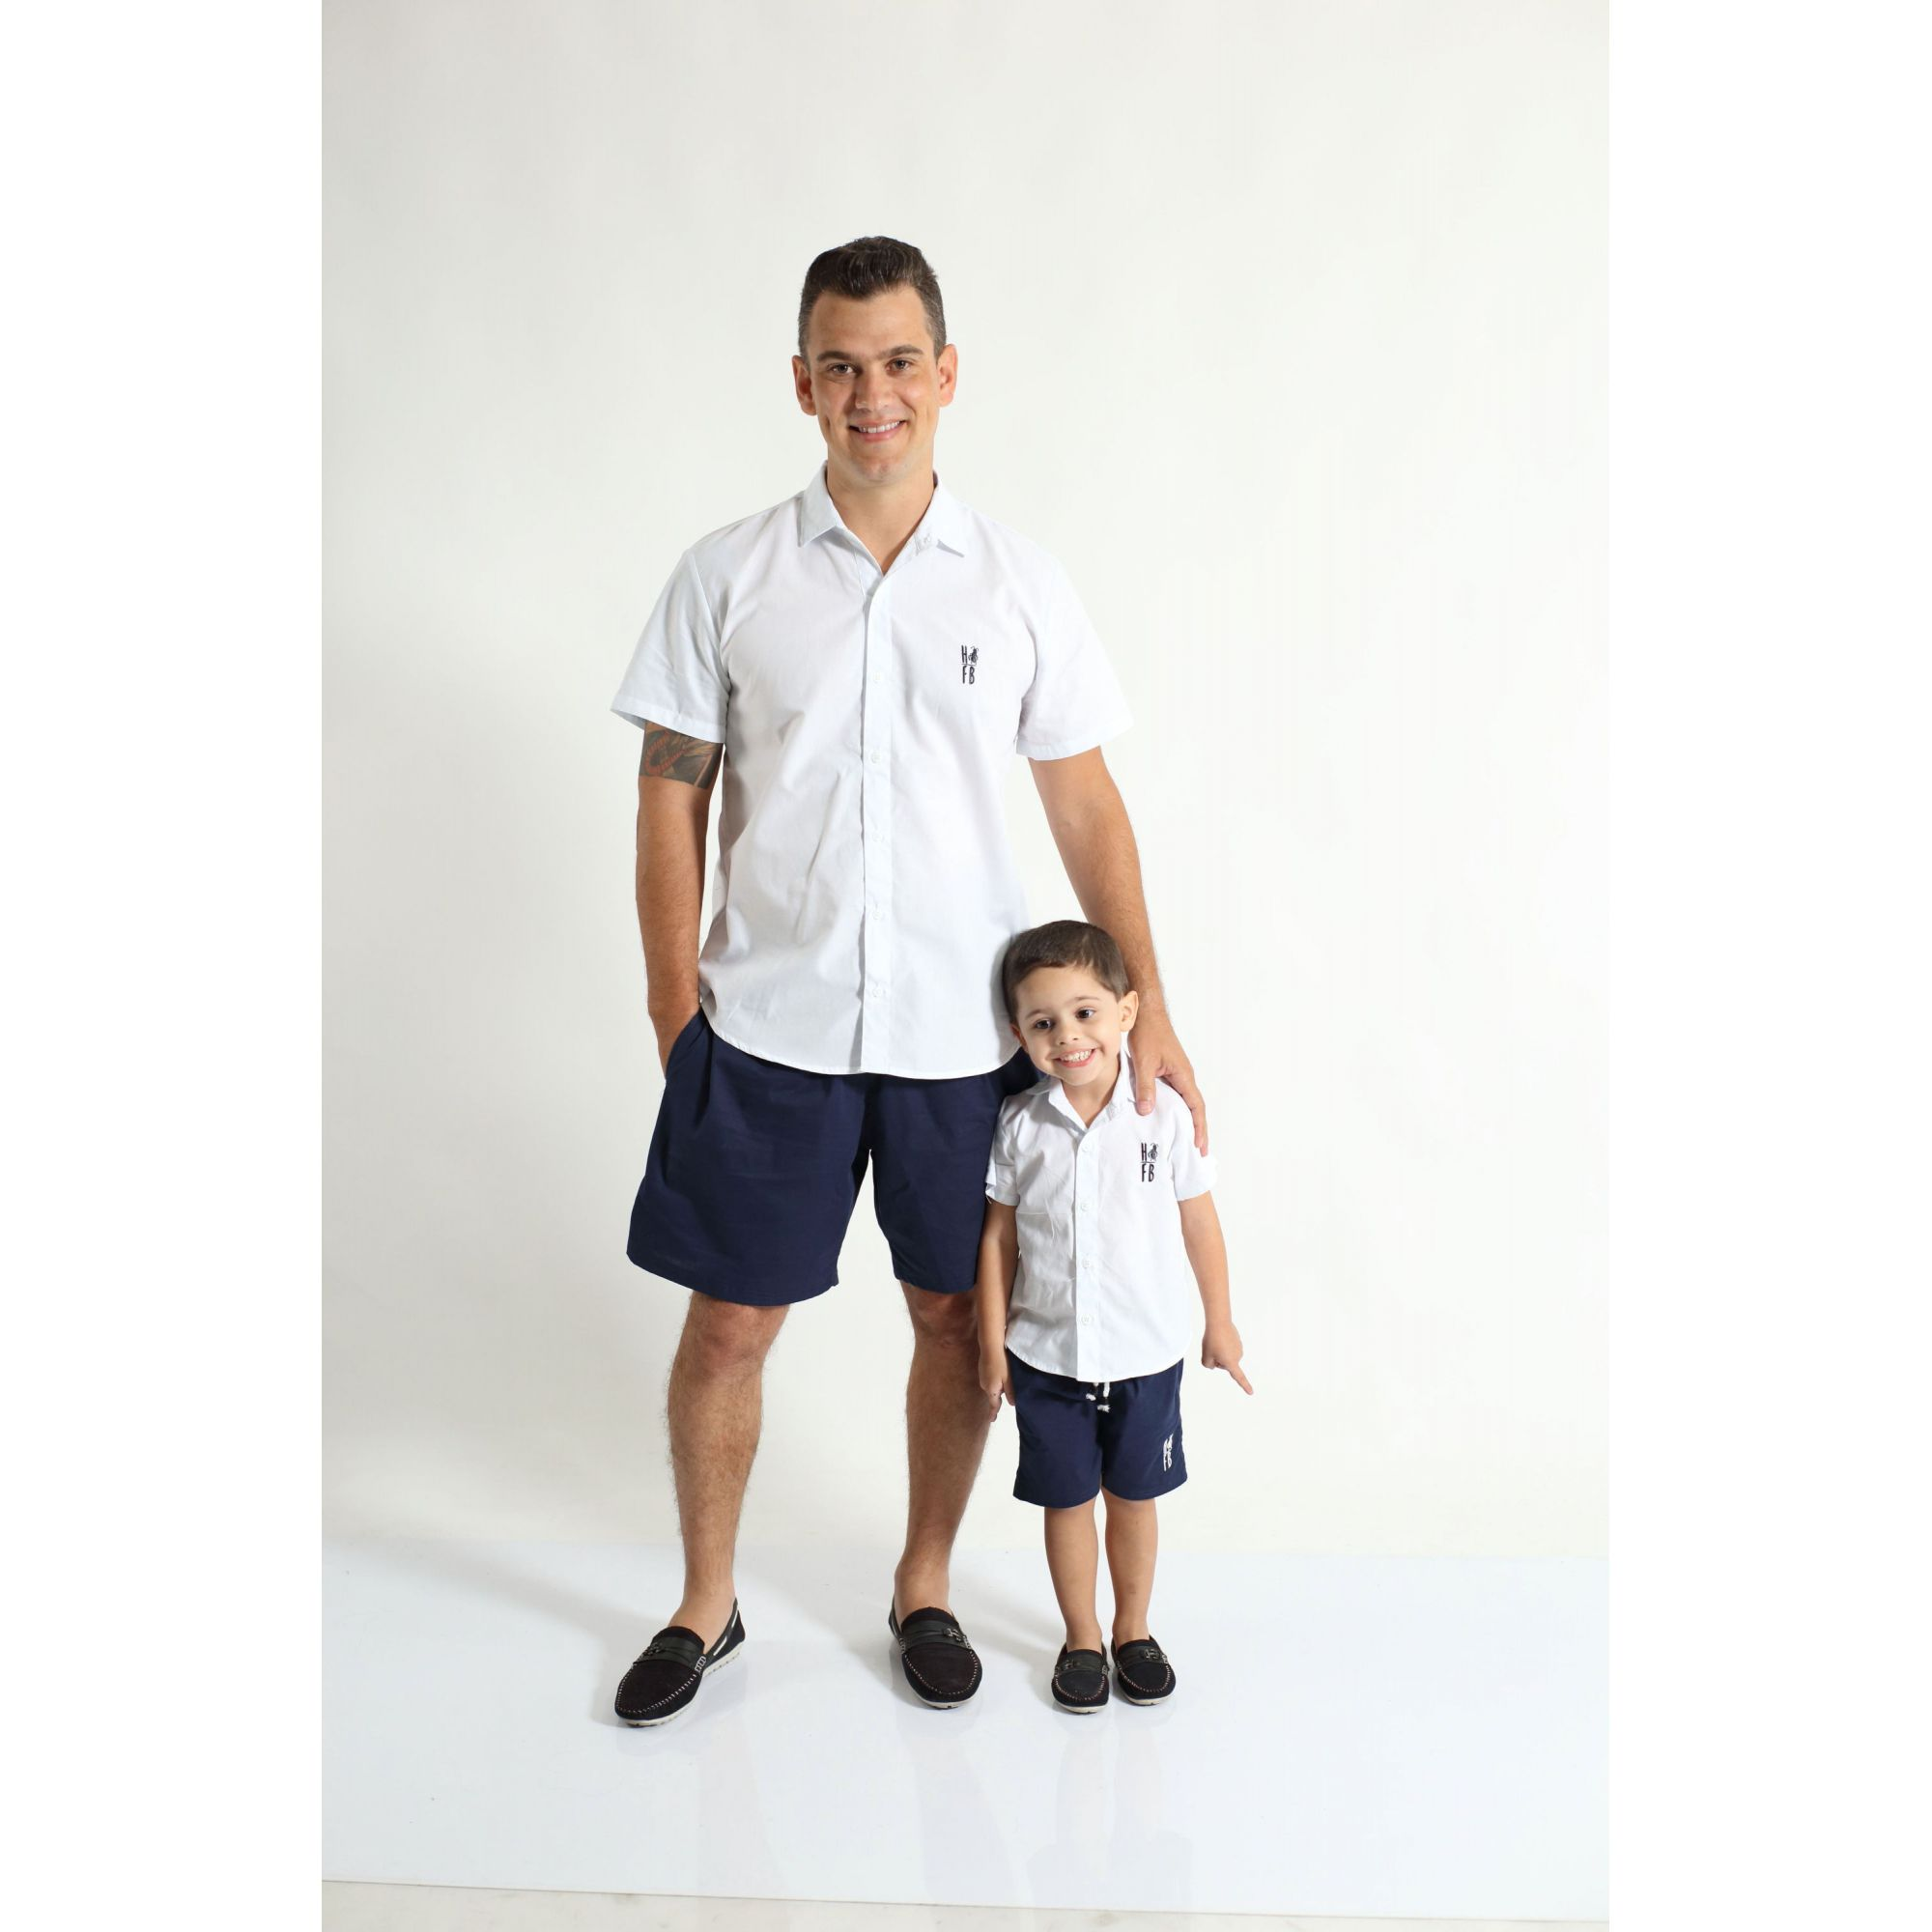 68035fc0a PAI E FILHO   Kit 02 Camisas Manga Curta Branca  Coleção Tal Pai Tal Filho  ...